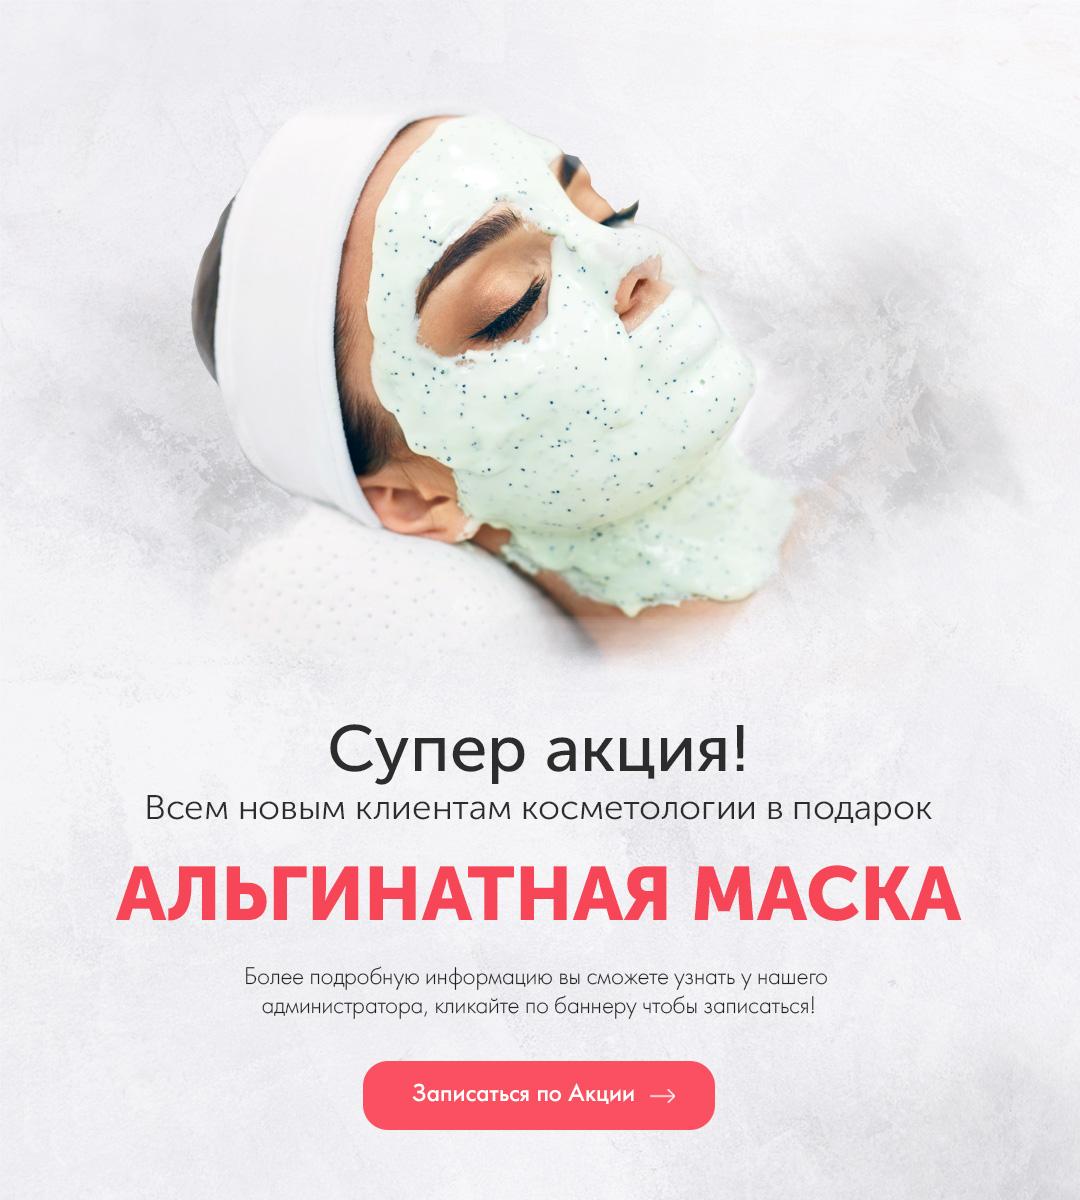 Альгинатная маска салон Люберцы